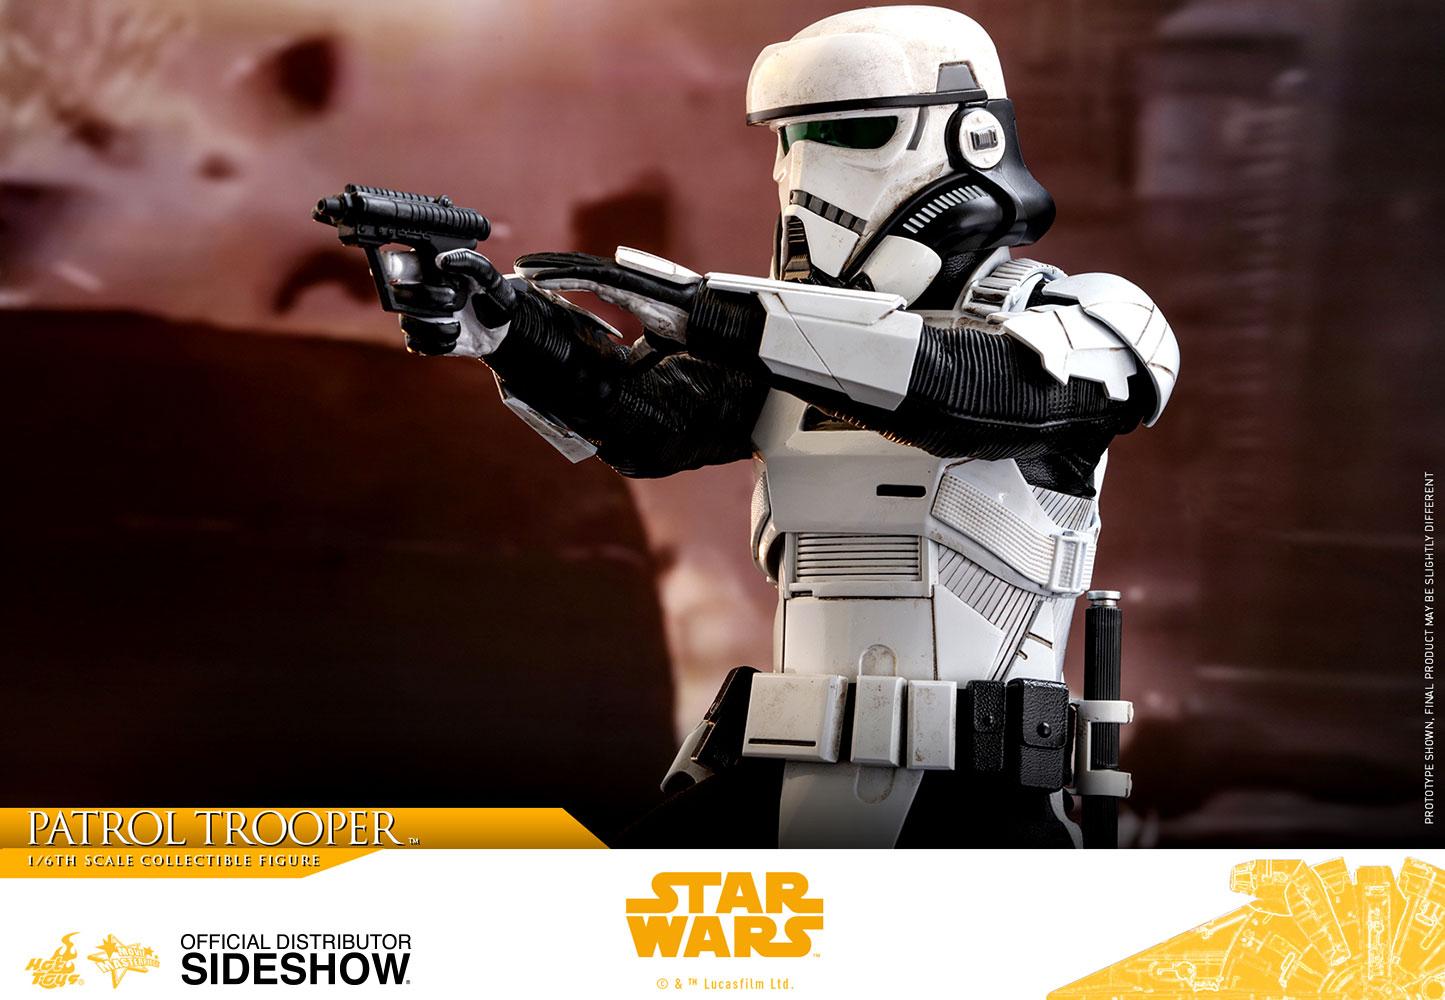 Imperial-Patrol-Trooper-sixth-scale-figure-03